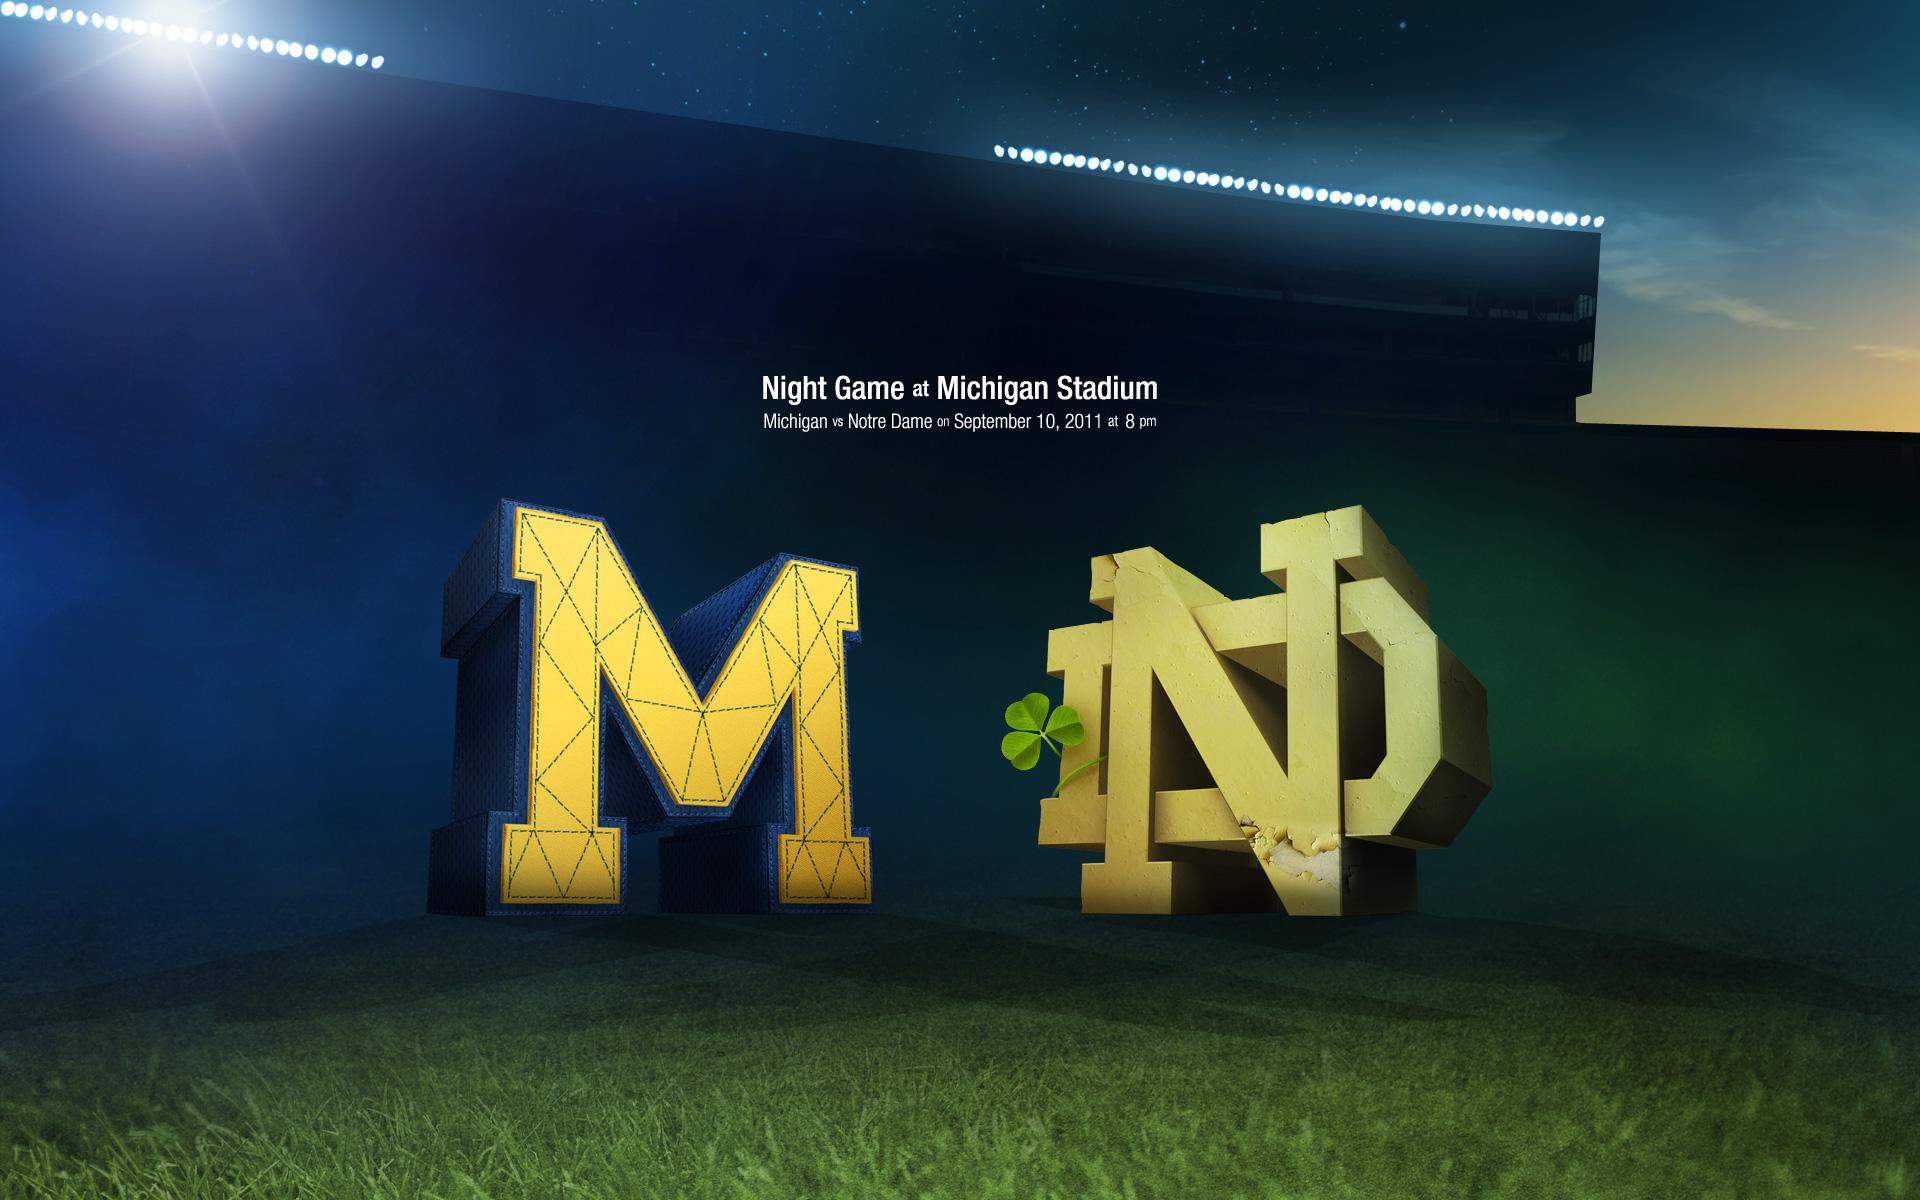 Michigan Football Wallpaper 2011 wallpaper   553738 1920x1200